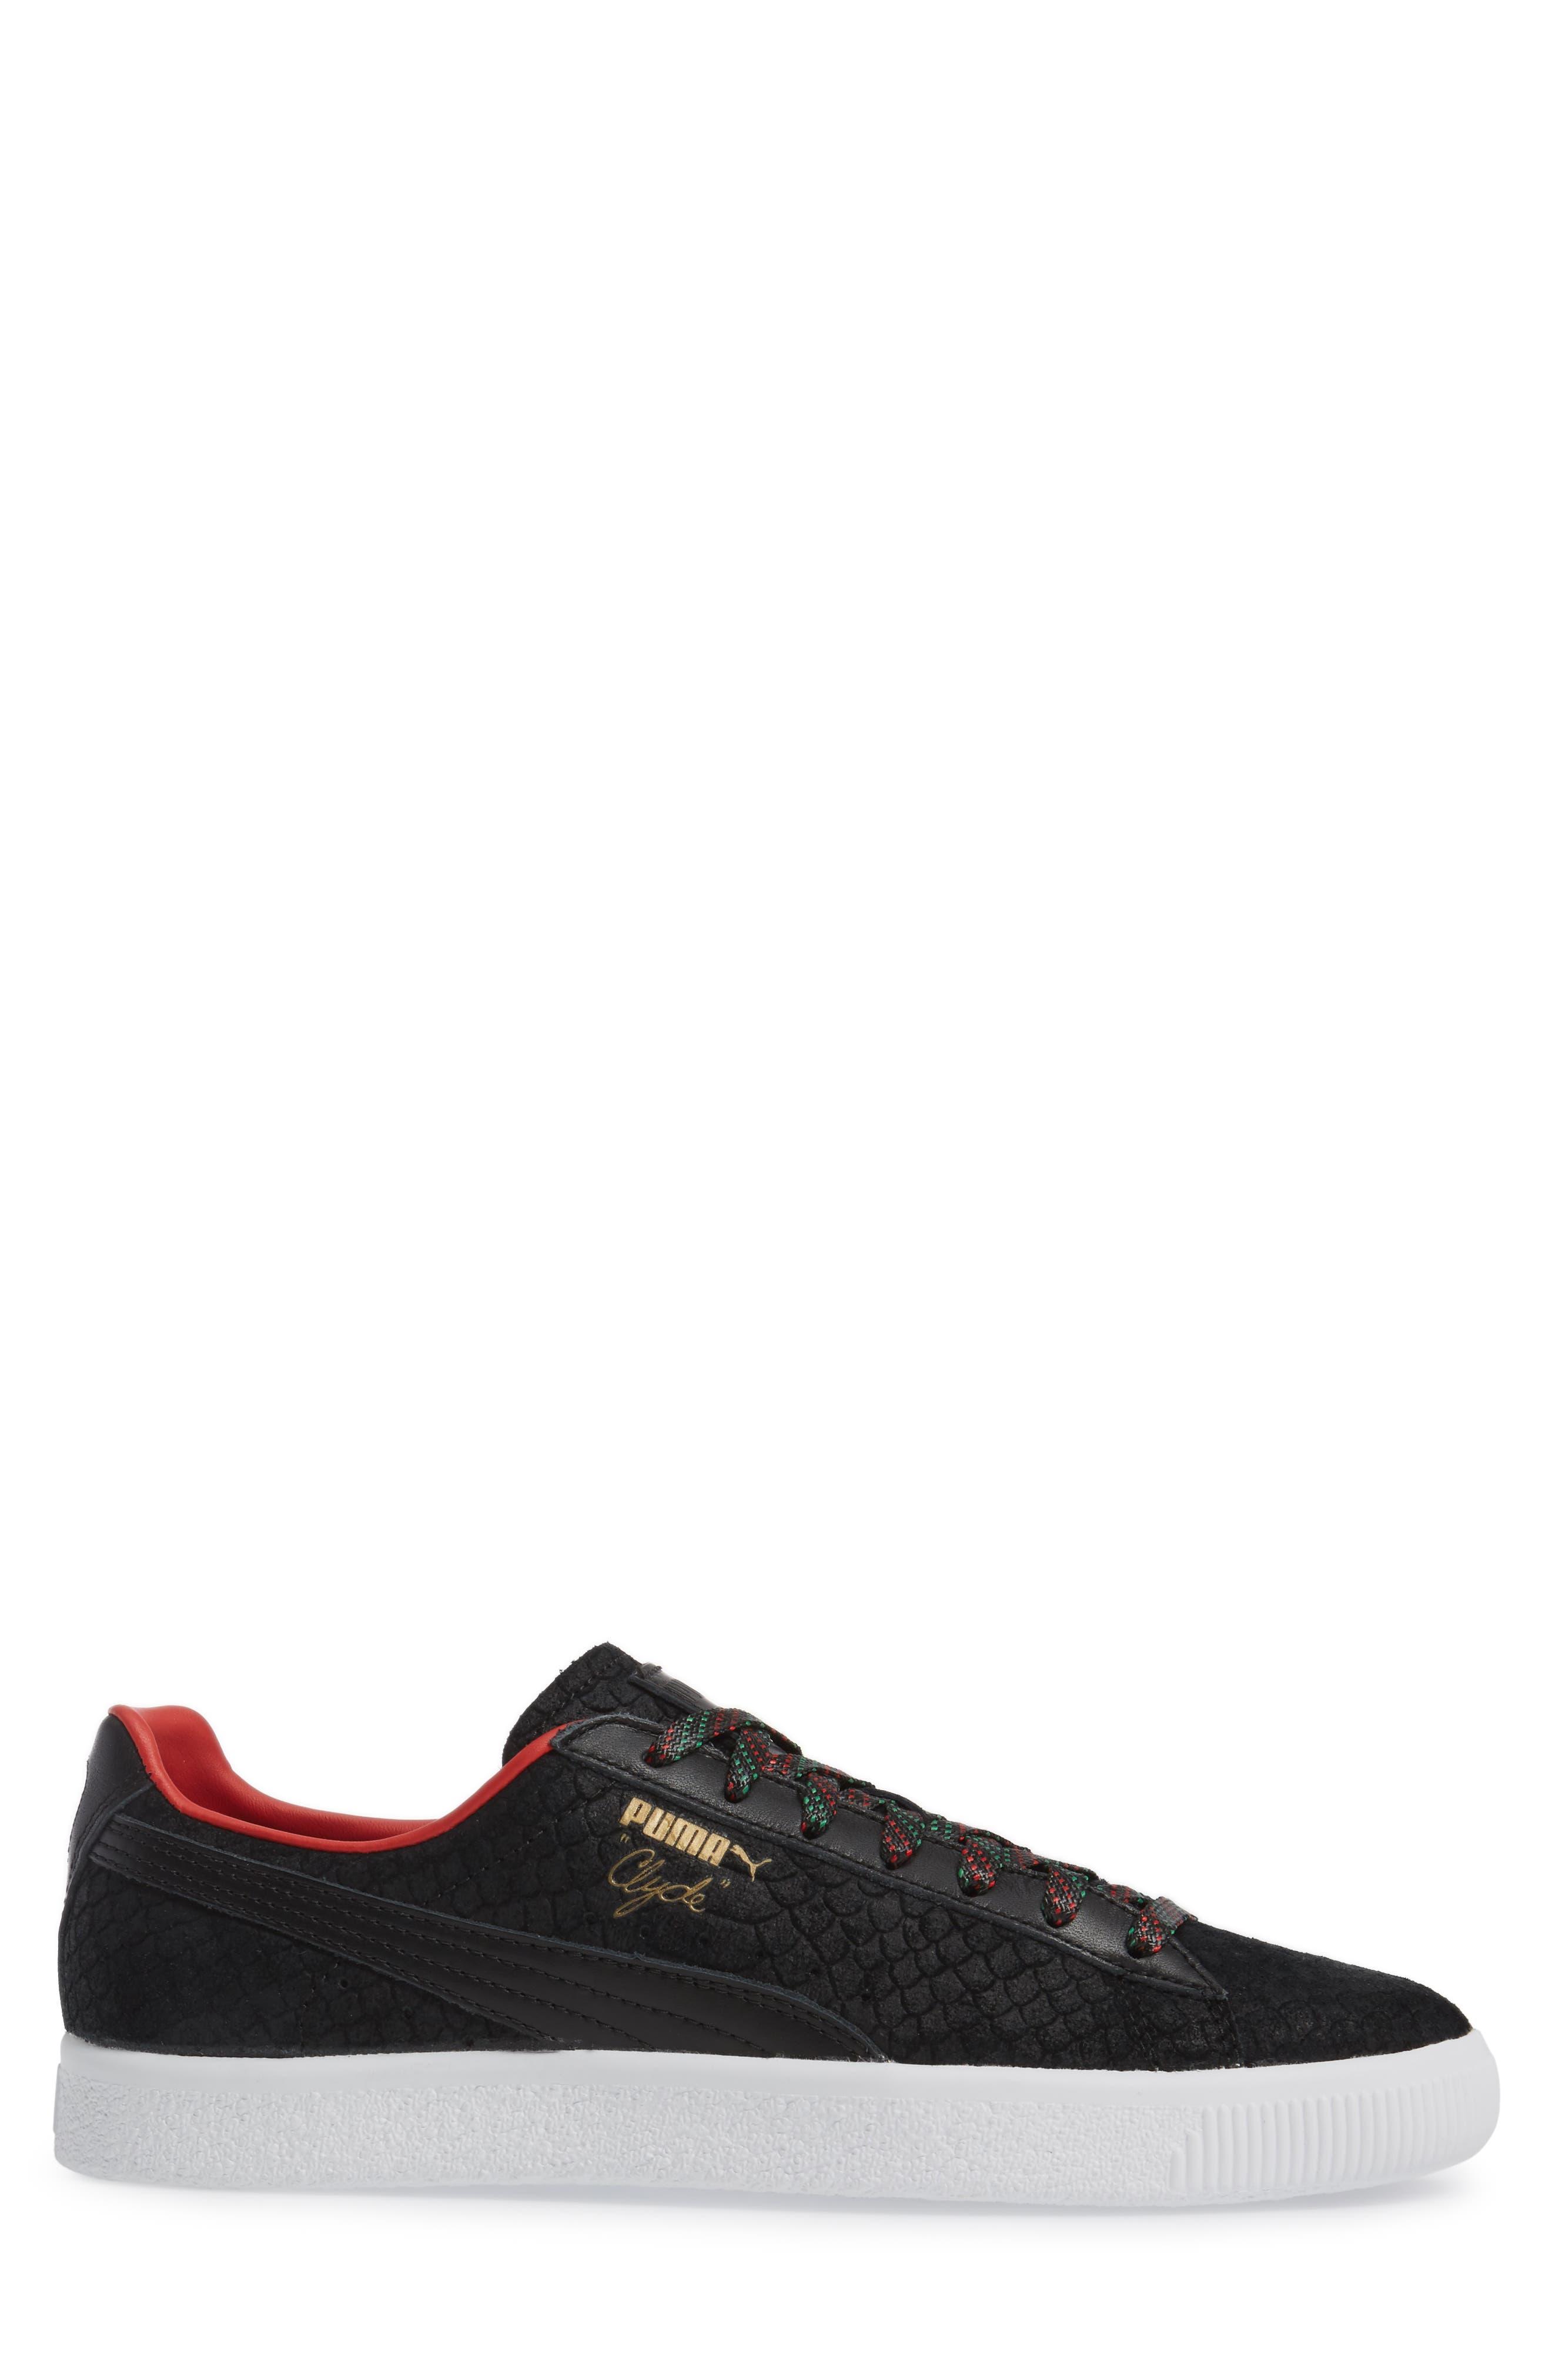 Clyde GCC Sneaker,                             Alternate thumbnail 3, color,                             001